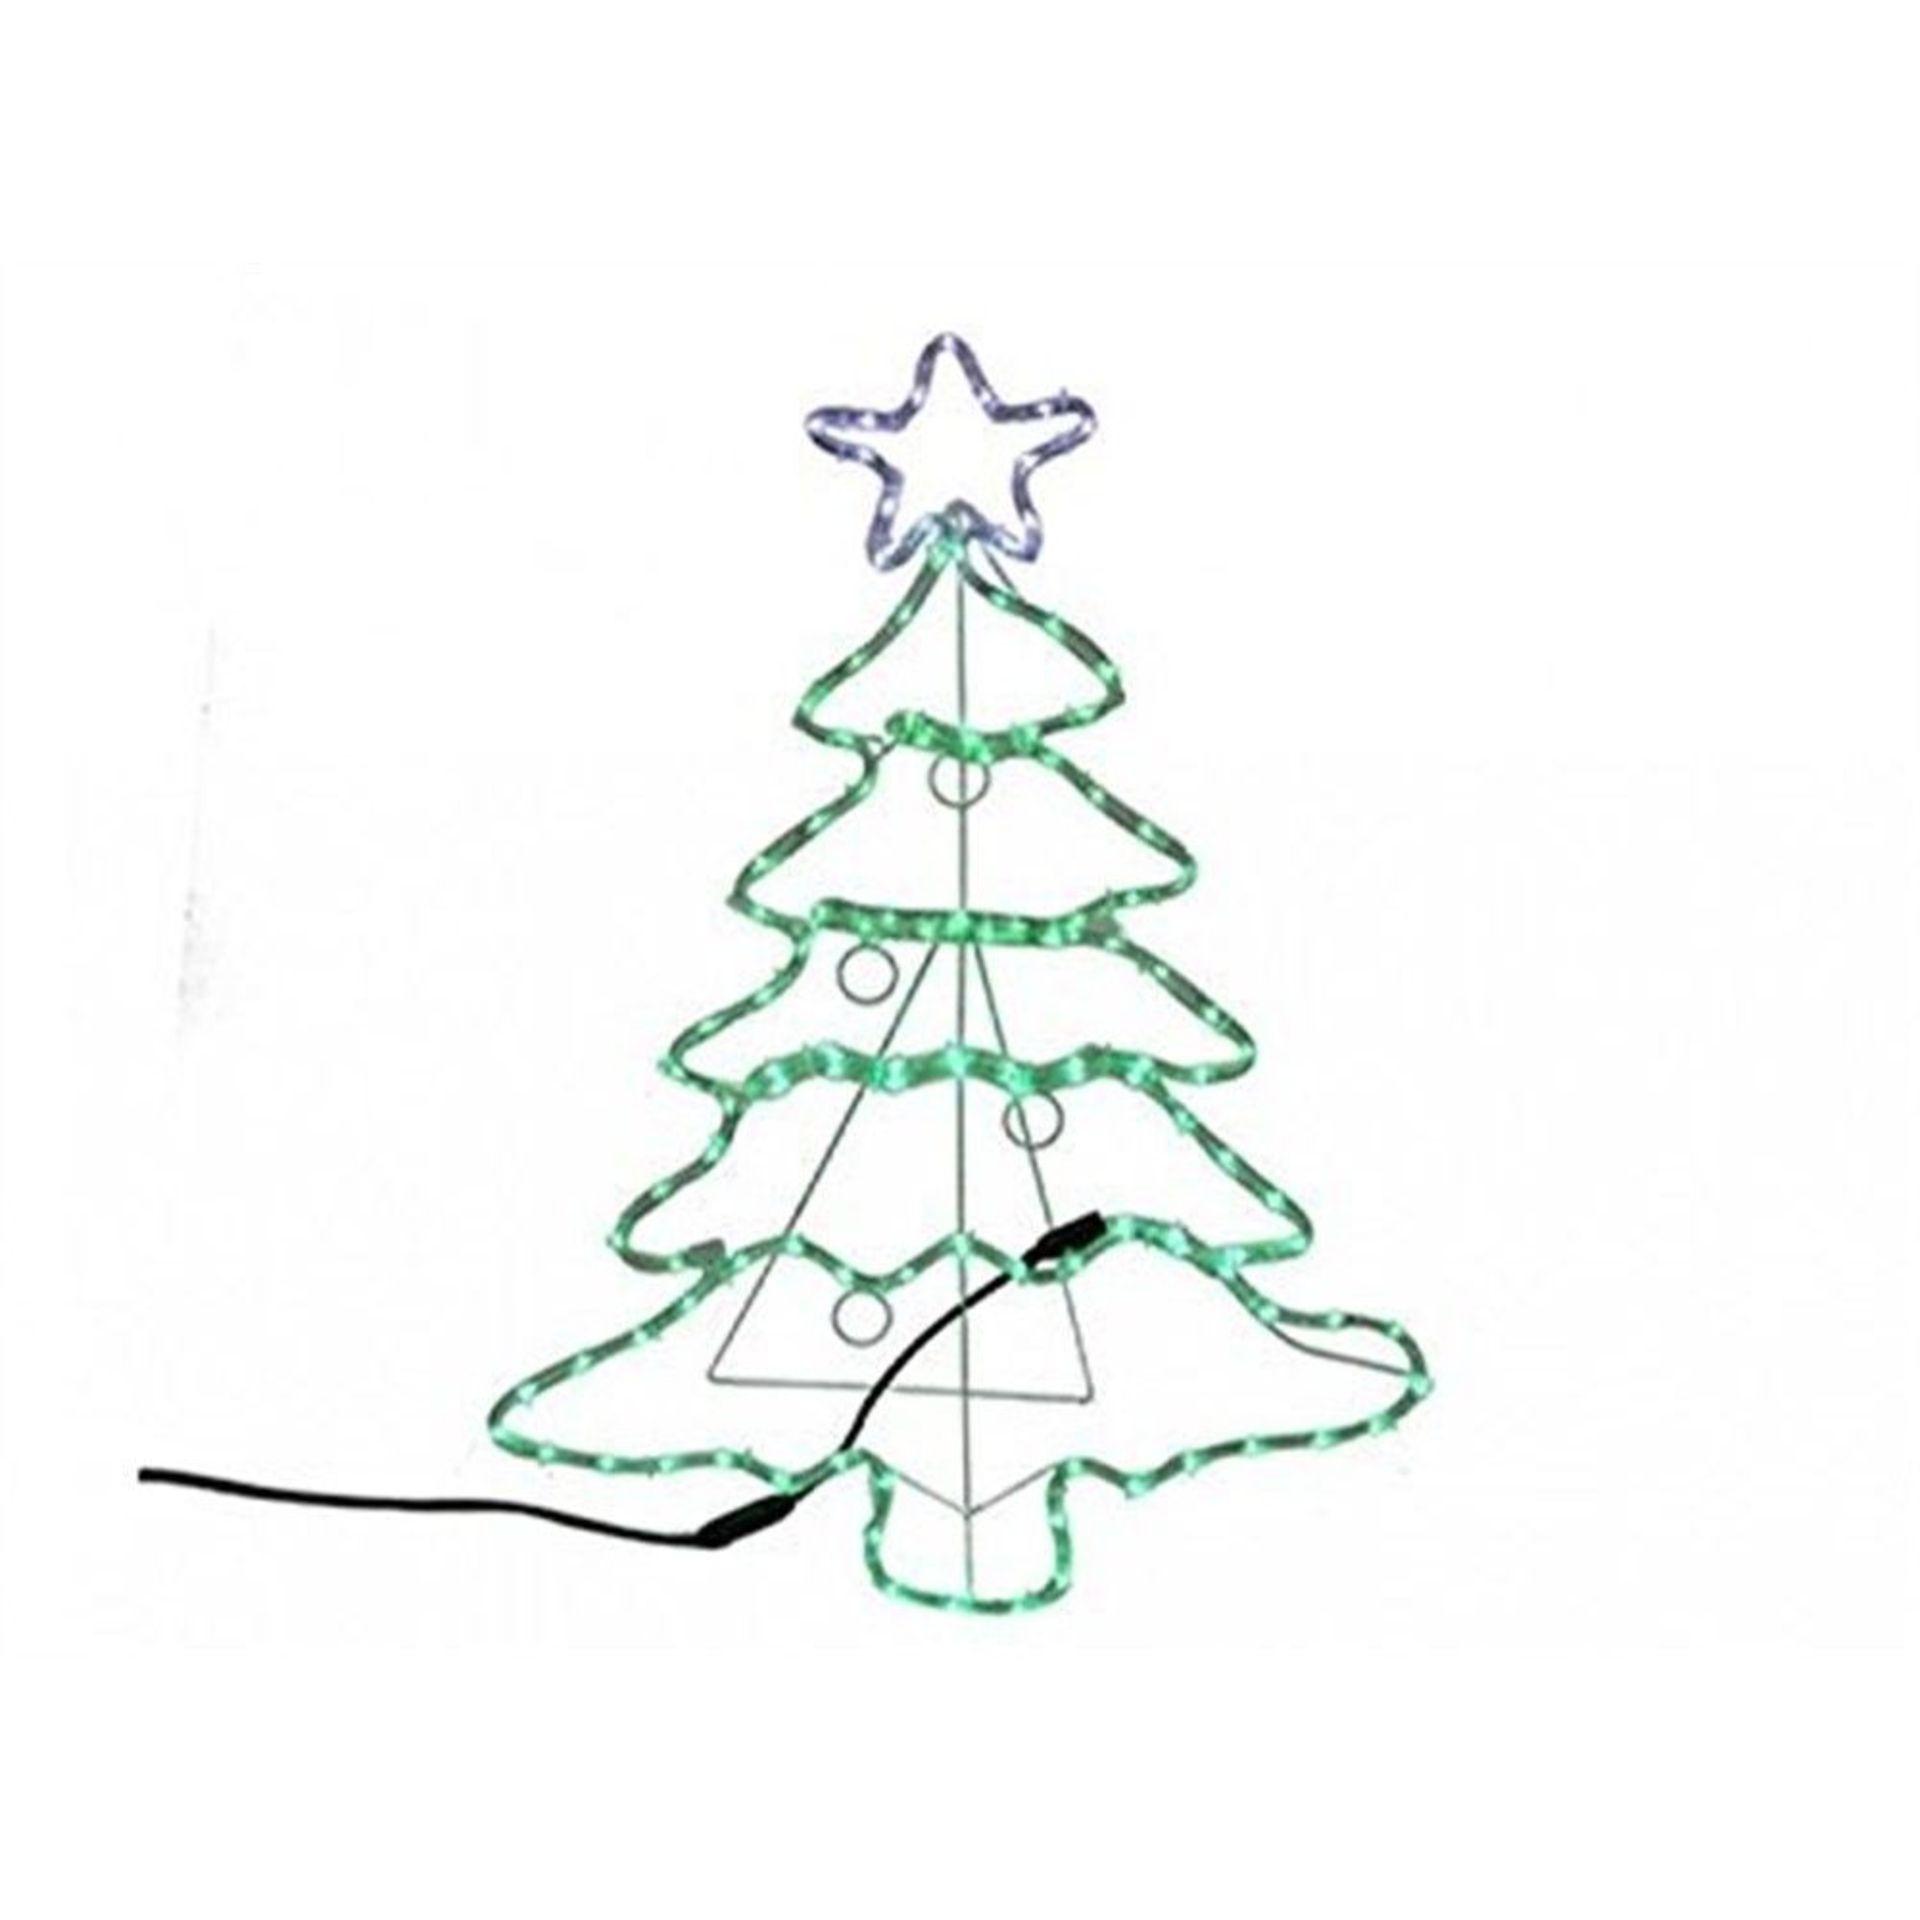 Lot 18007 - V Brand New 88CM Light Up Christmas Tree